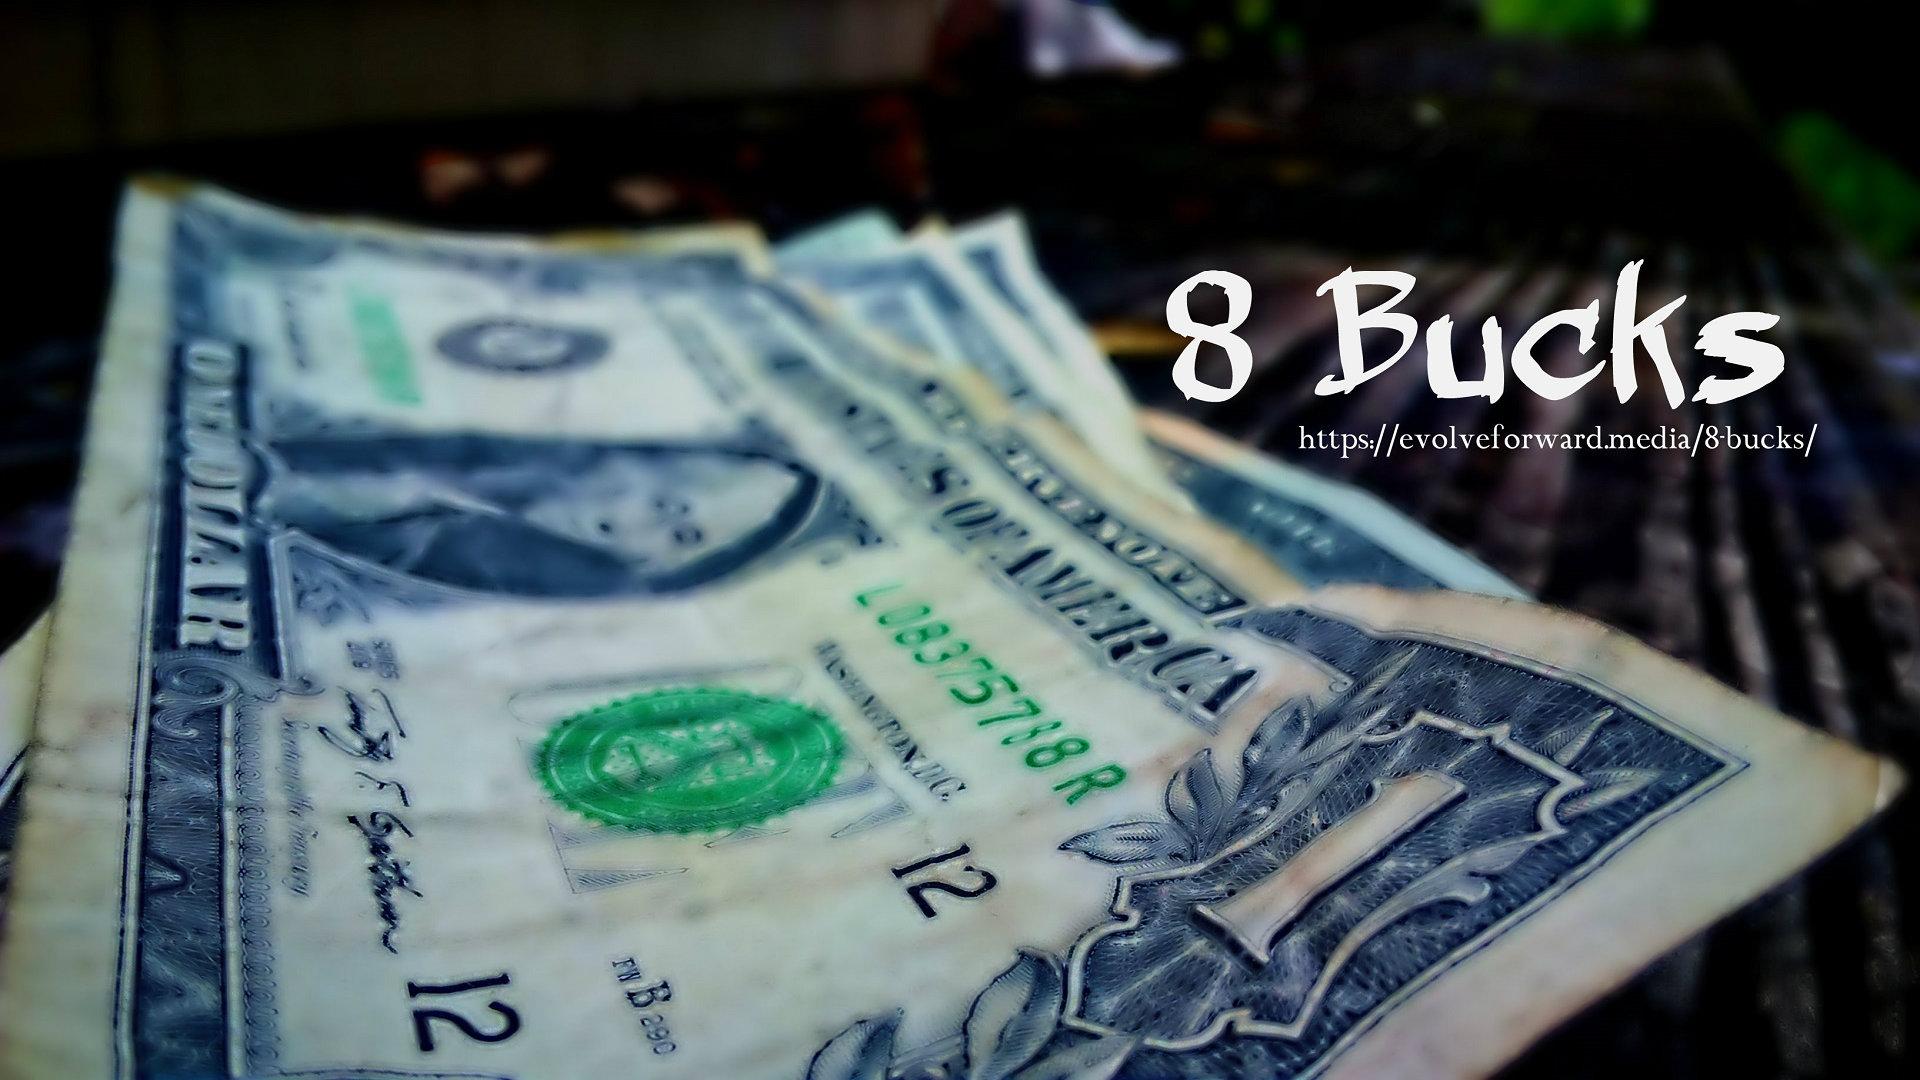 8 Bucks